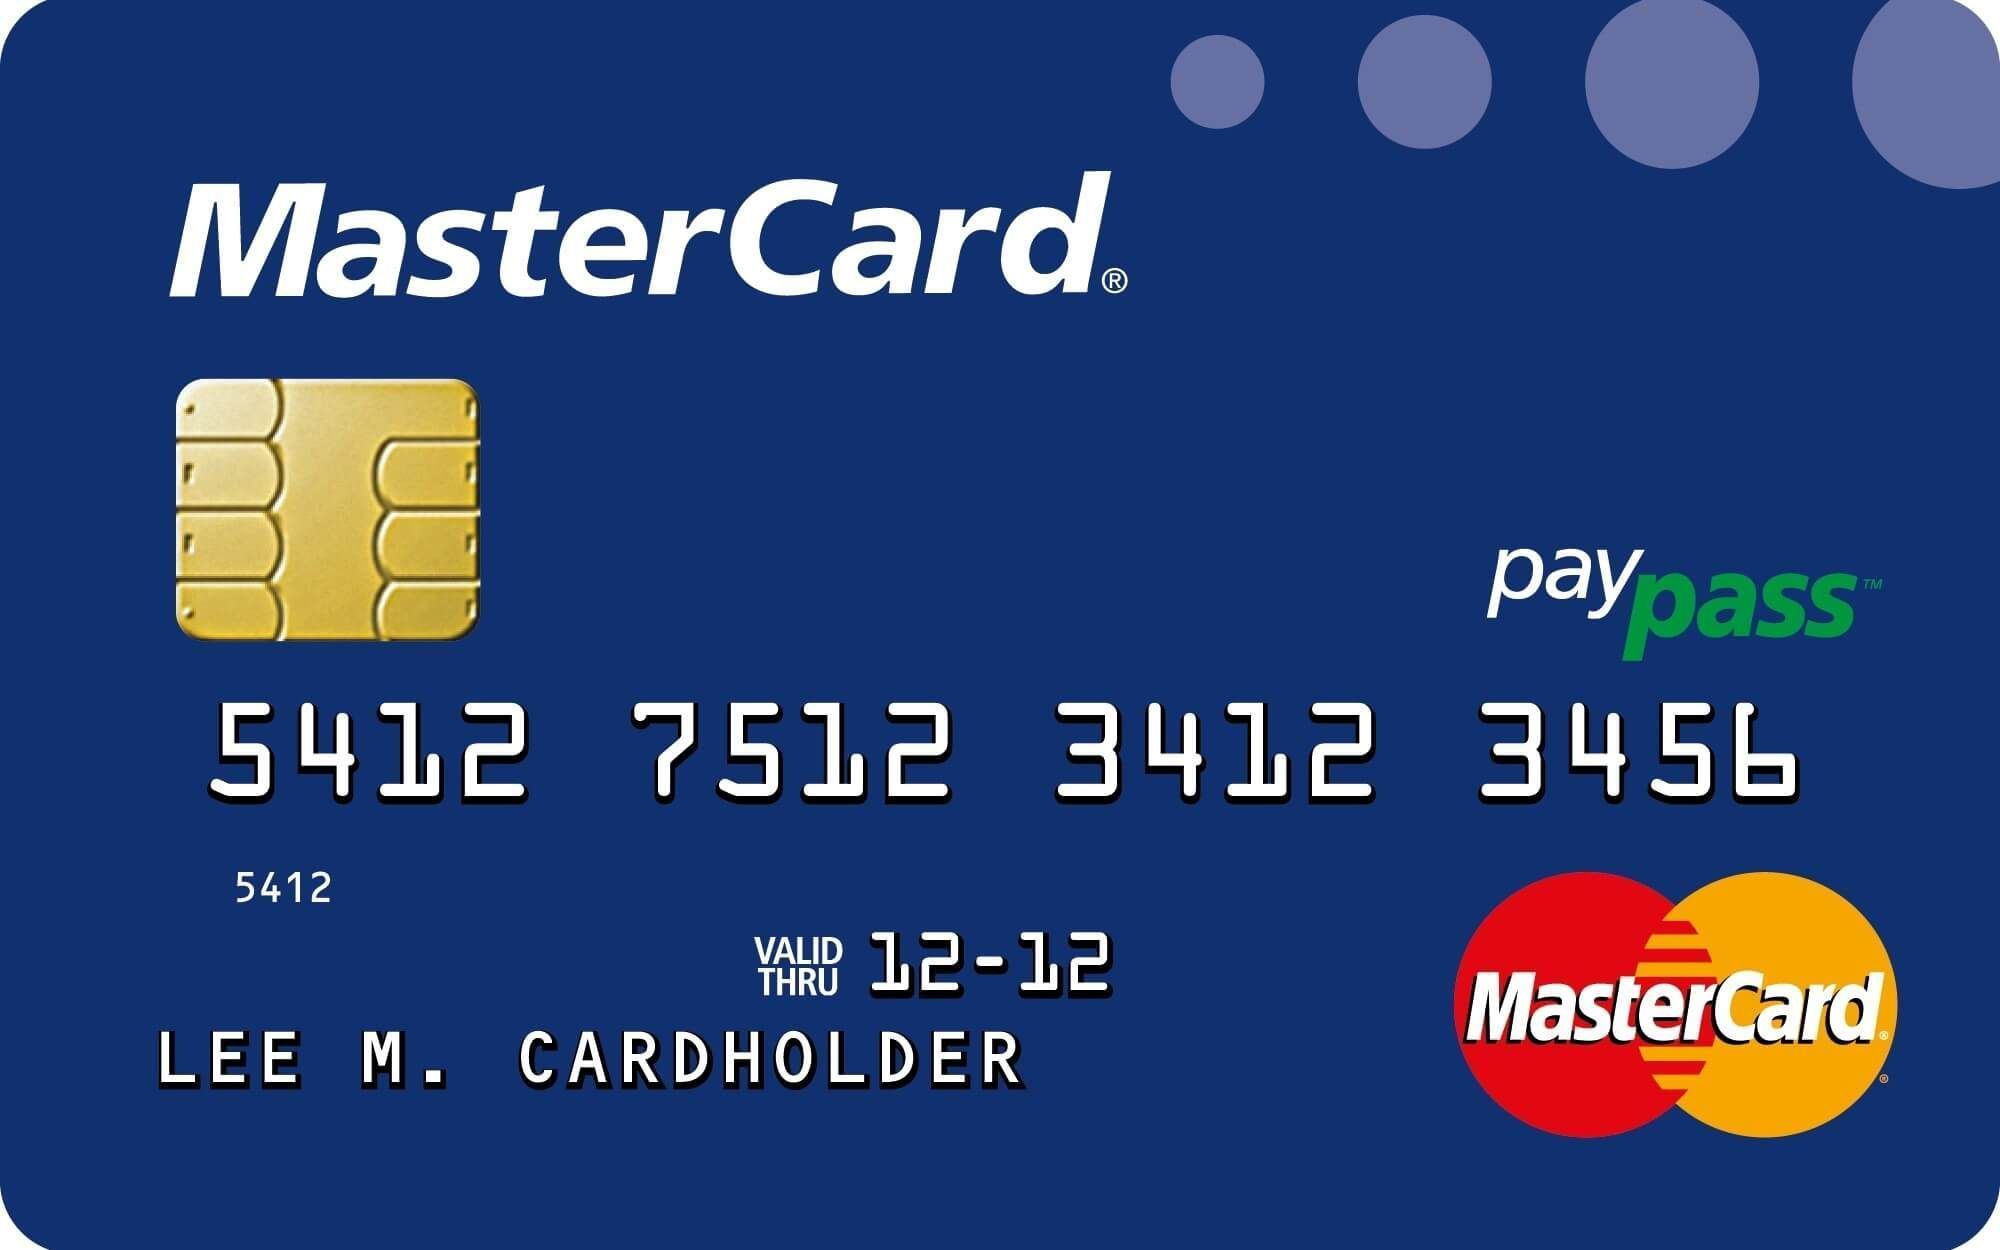 Credit Cards Generator Free Credit Card Real Credit Card Generator 8 Free To Use Credit Card App Free Visa Card Mastercard Gift Card